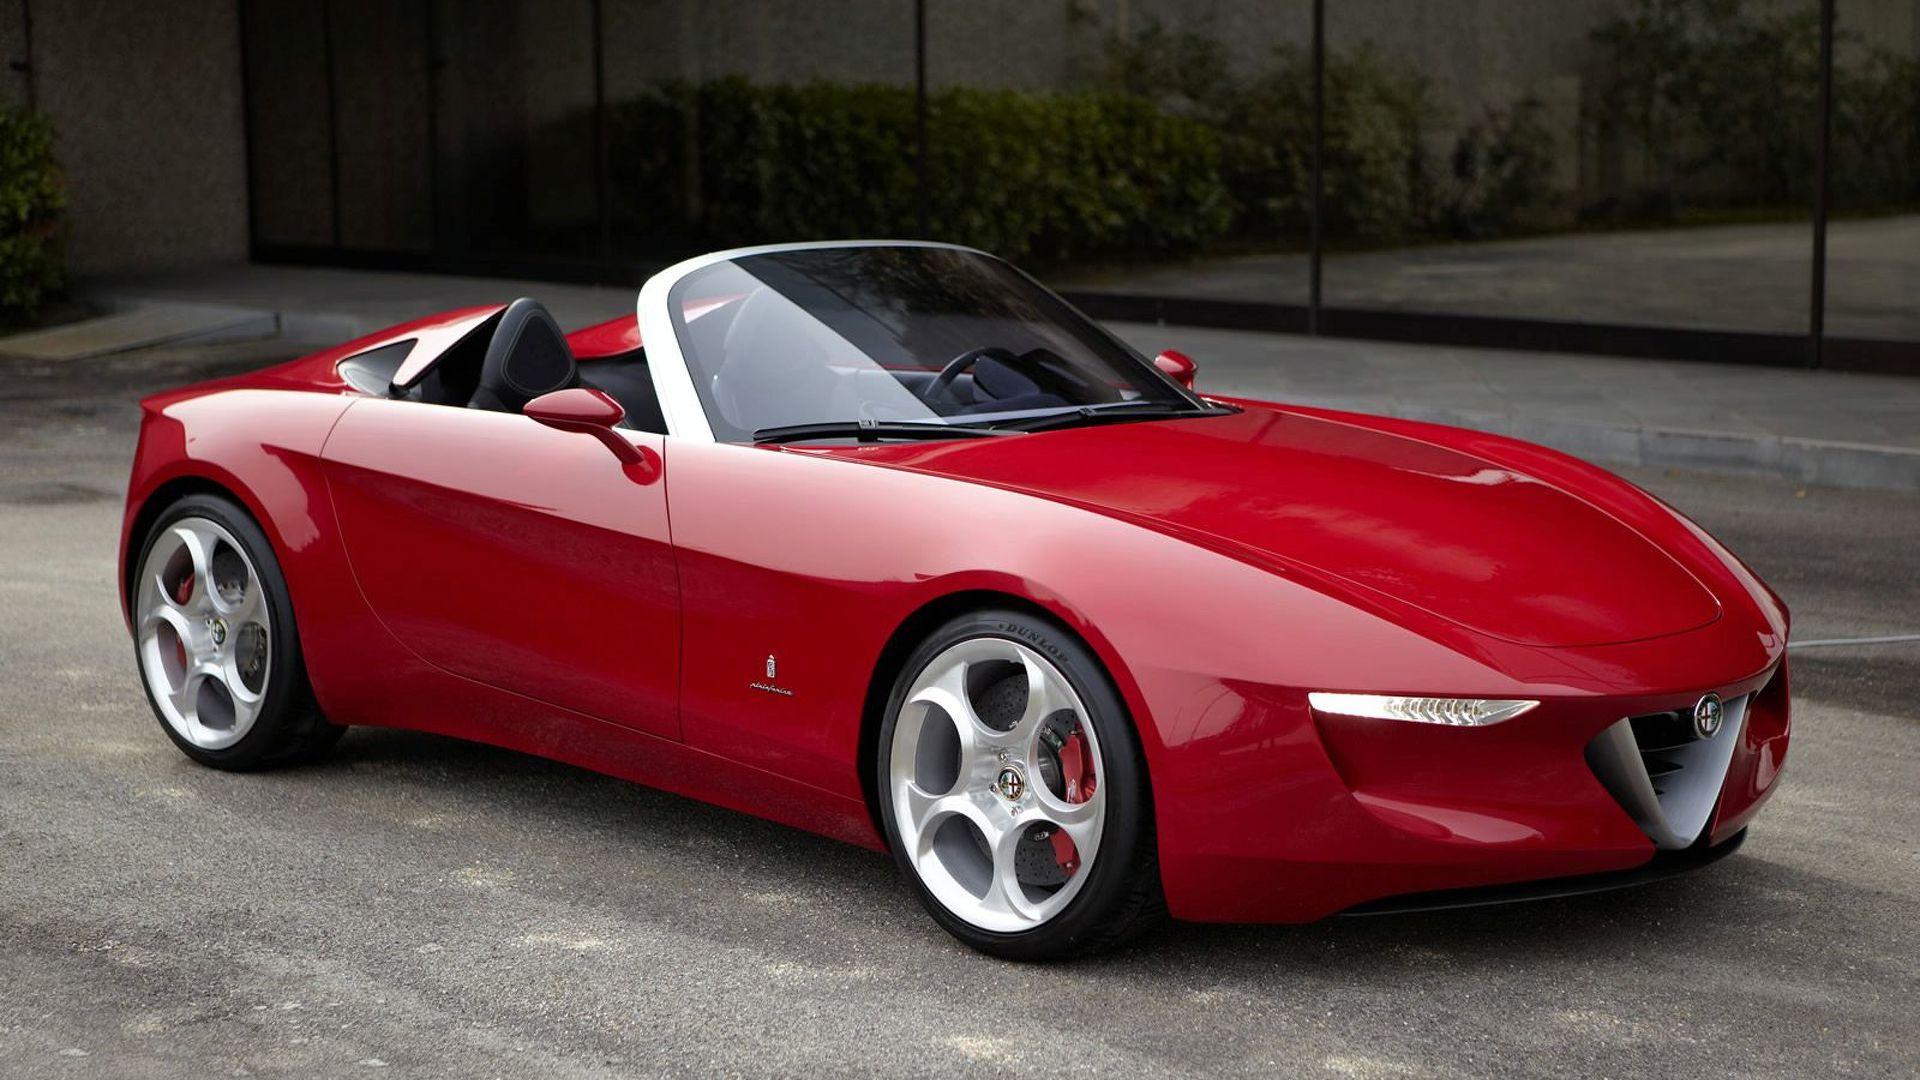 Alfa Romeo planning new Spider model to rival MX-5